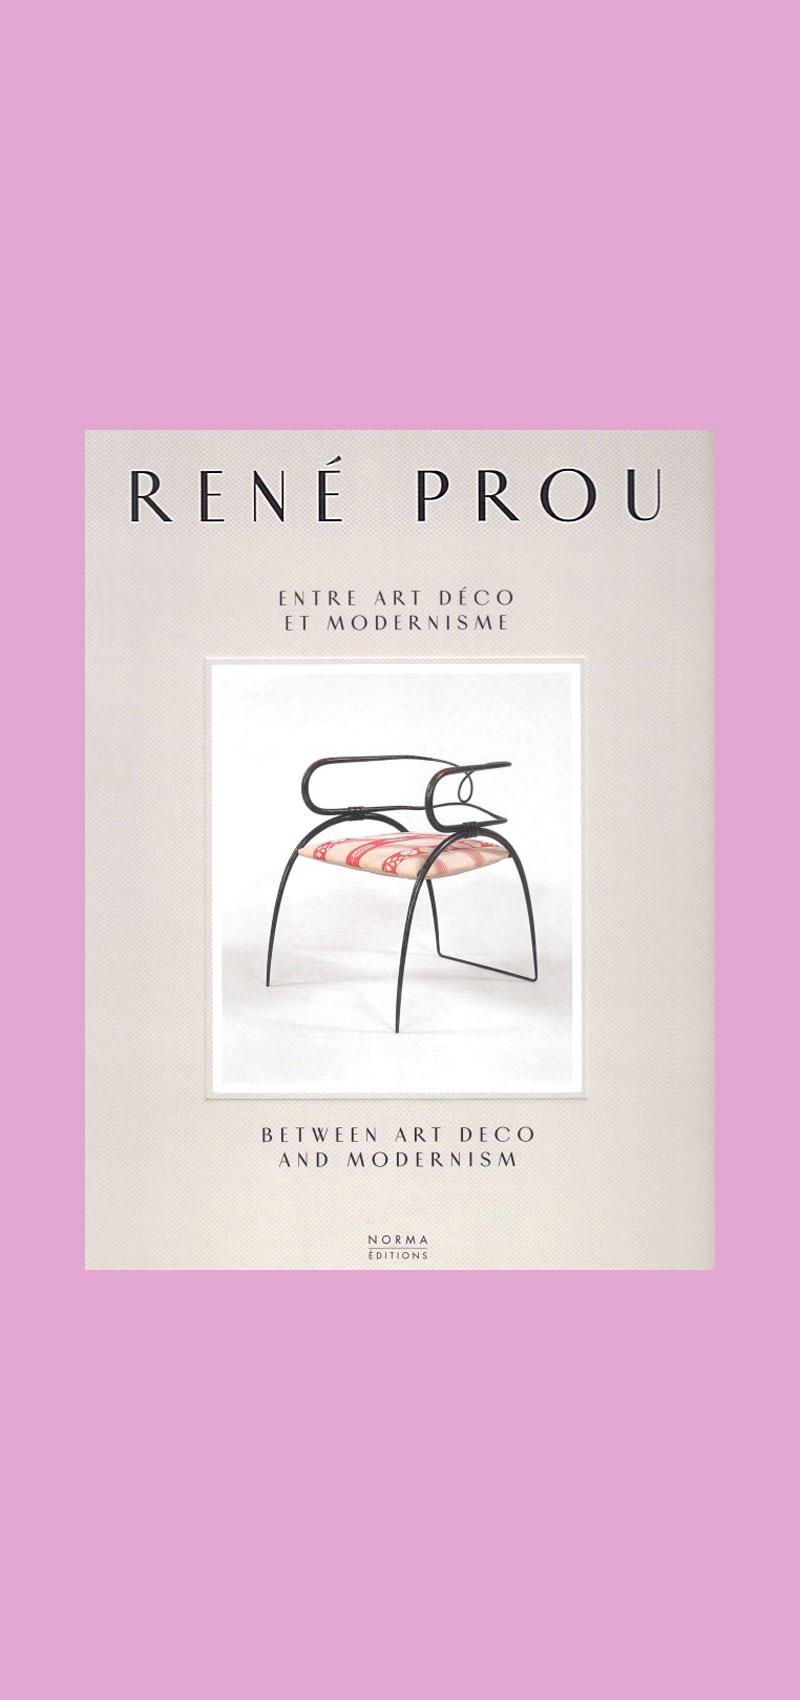 René Prou: Between Art Deco and Modernism